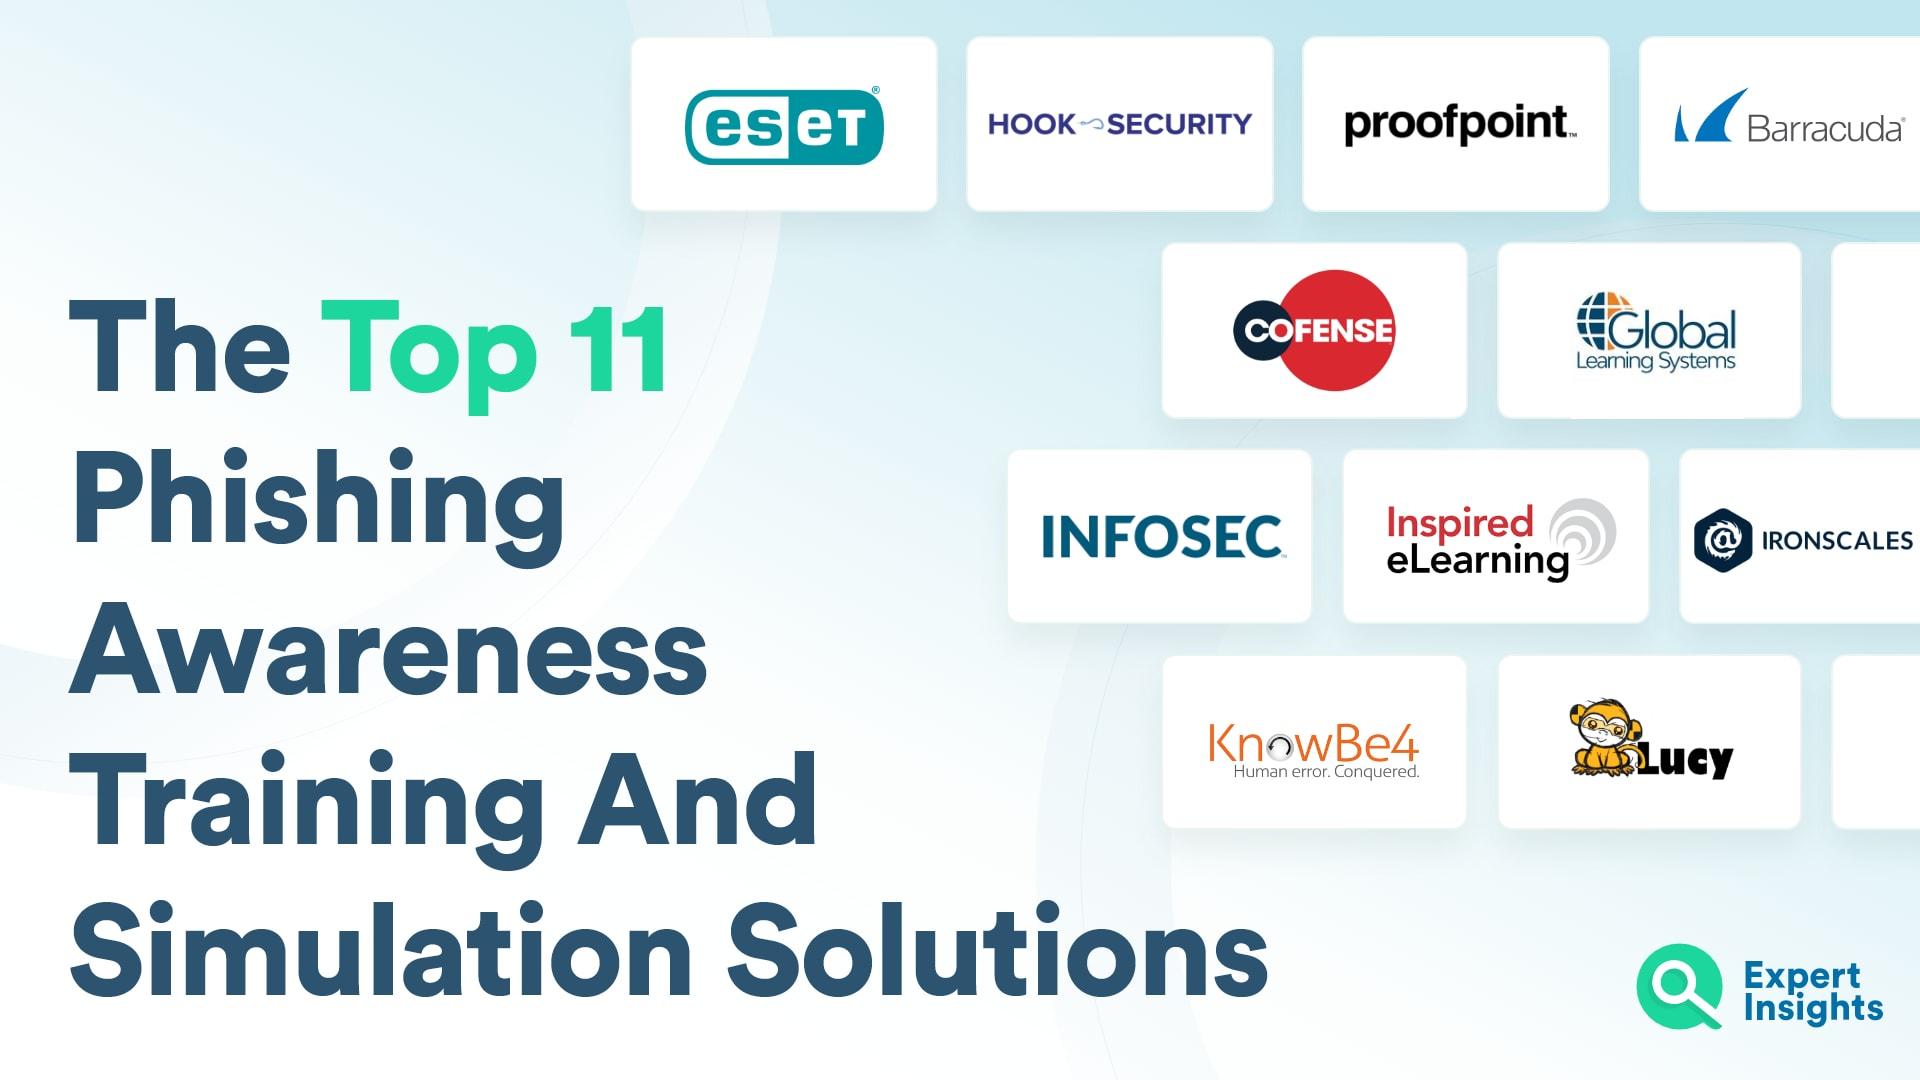 Top 11 Phishing Awareness Training Solutions - Expert Insights